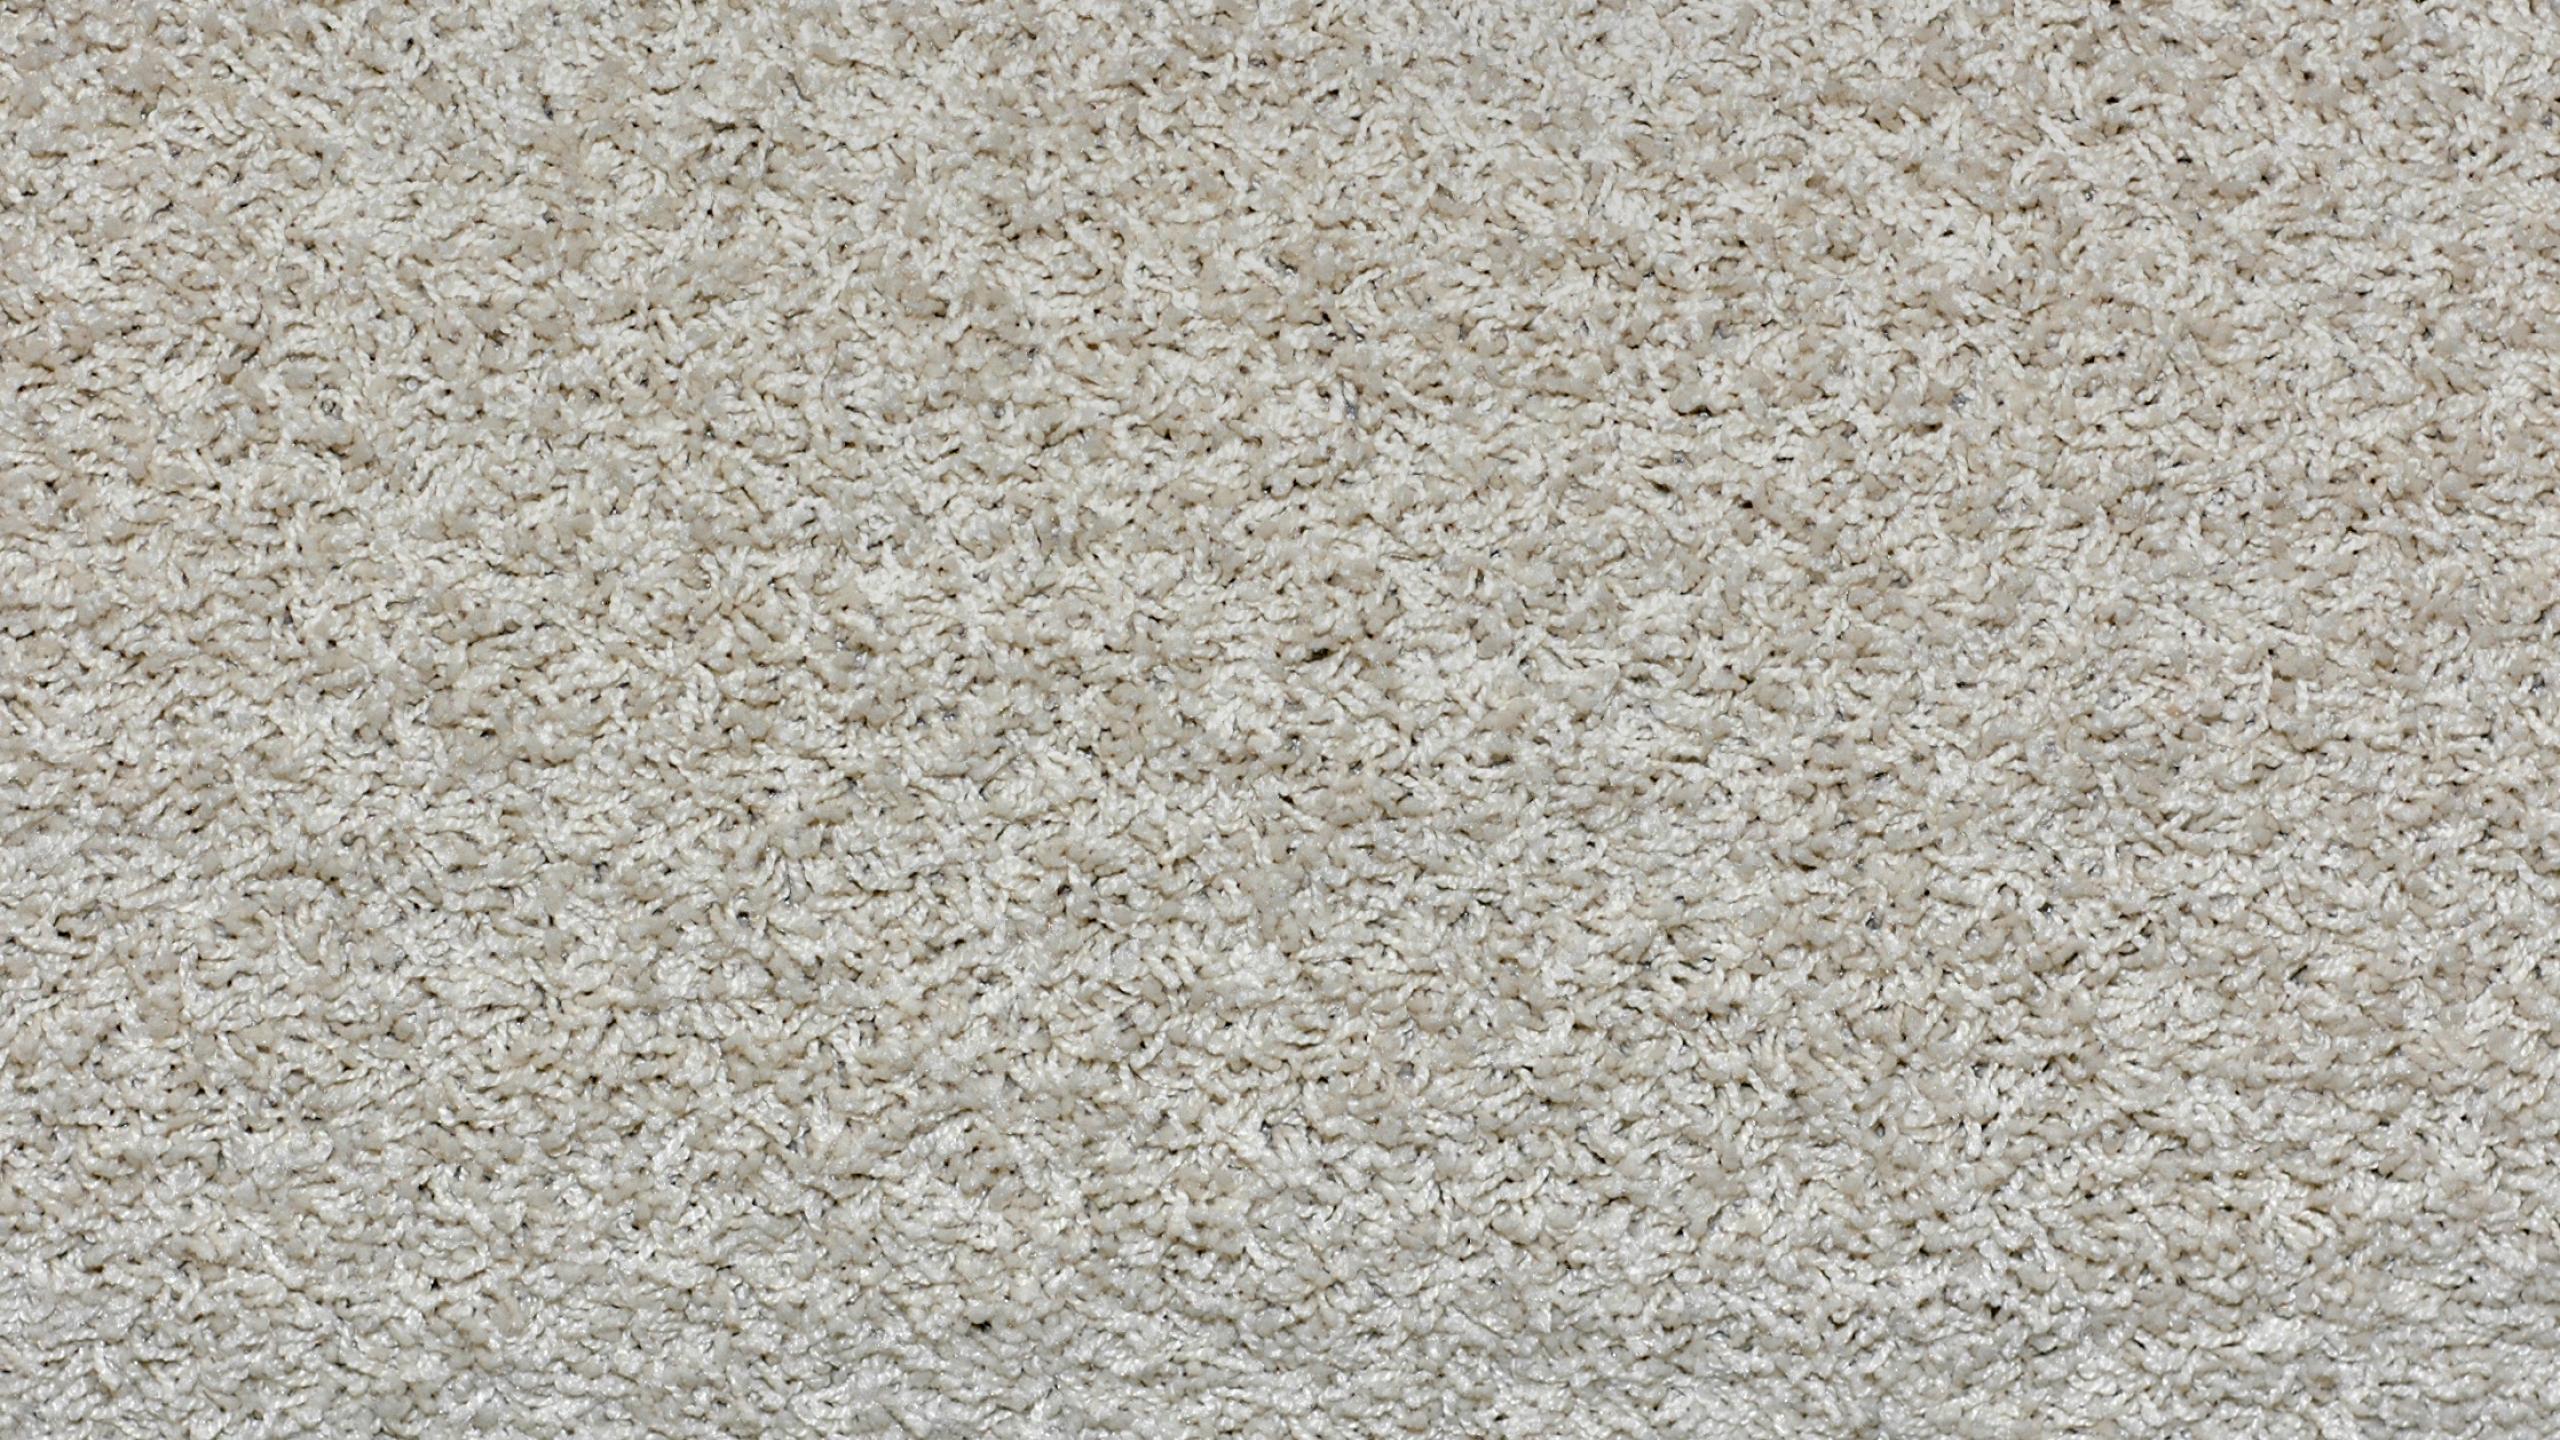 texture_canvas_woven_palace_2560x1440_hd-wallpaper-291521